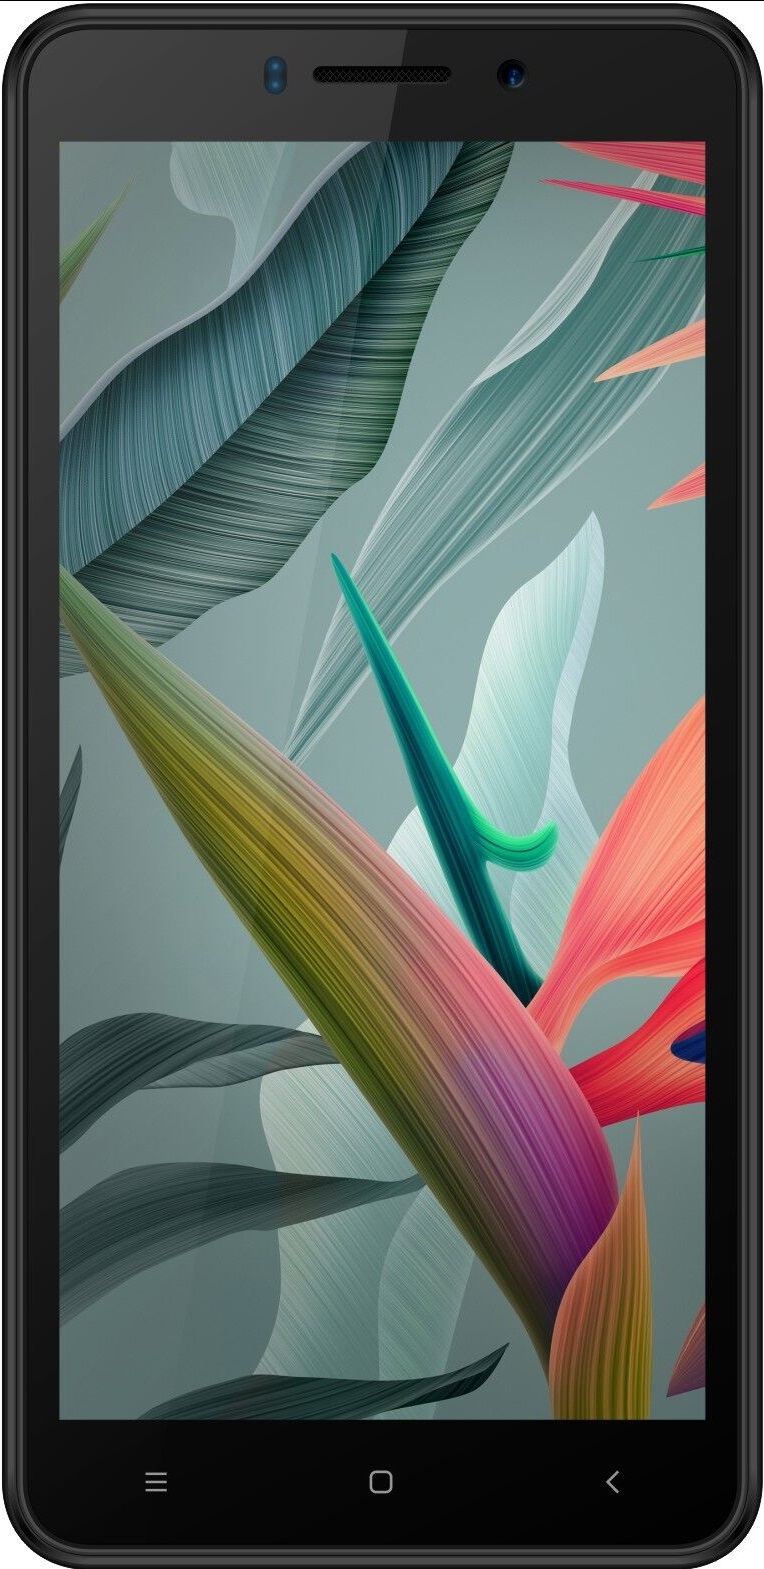 Смартфон Oukitel C10 8 GB, серый смартфон oukitel c10 pro 8 gb черный